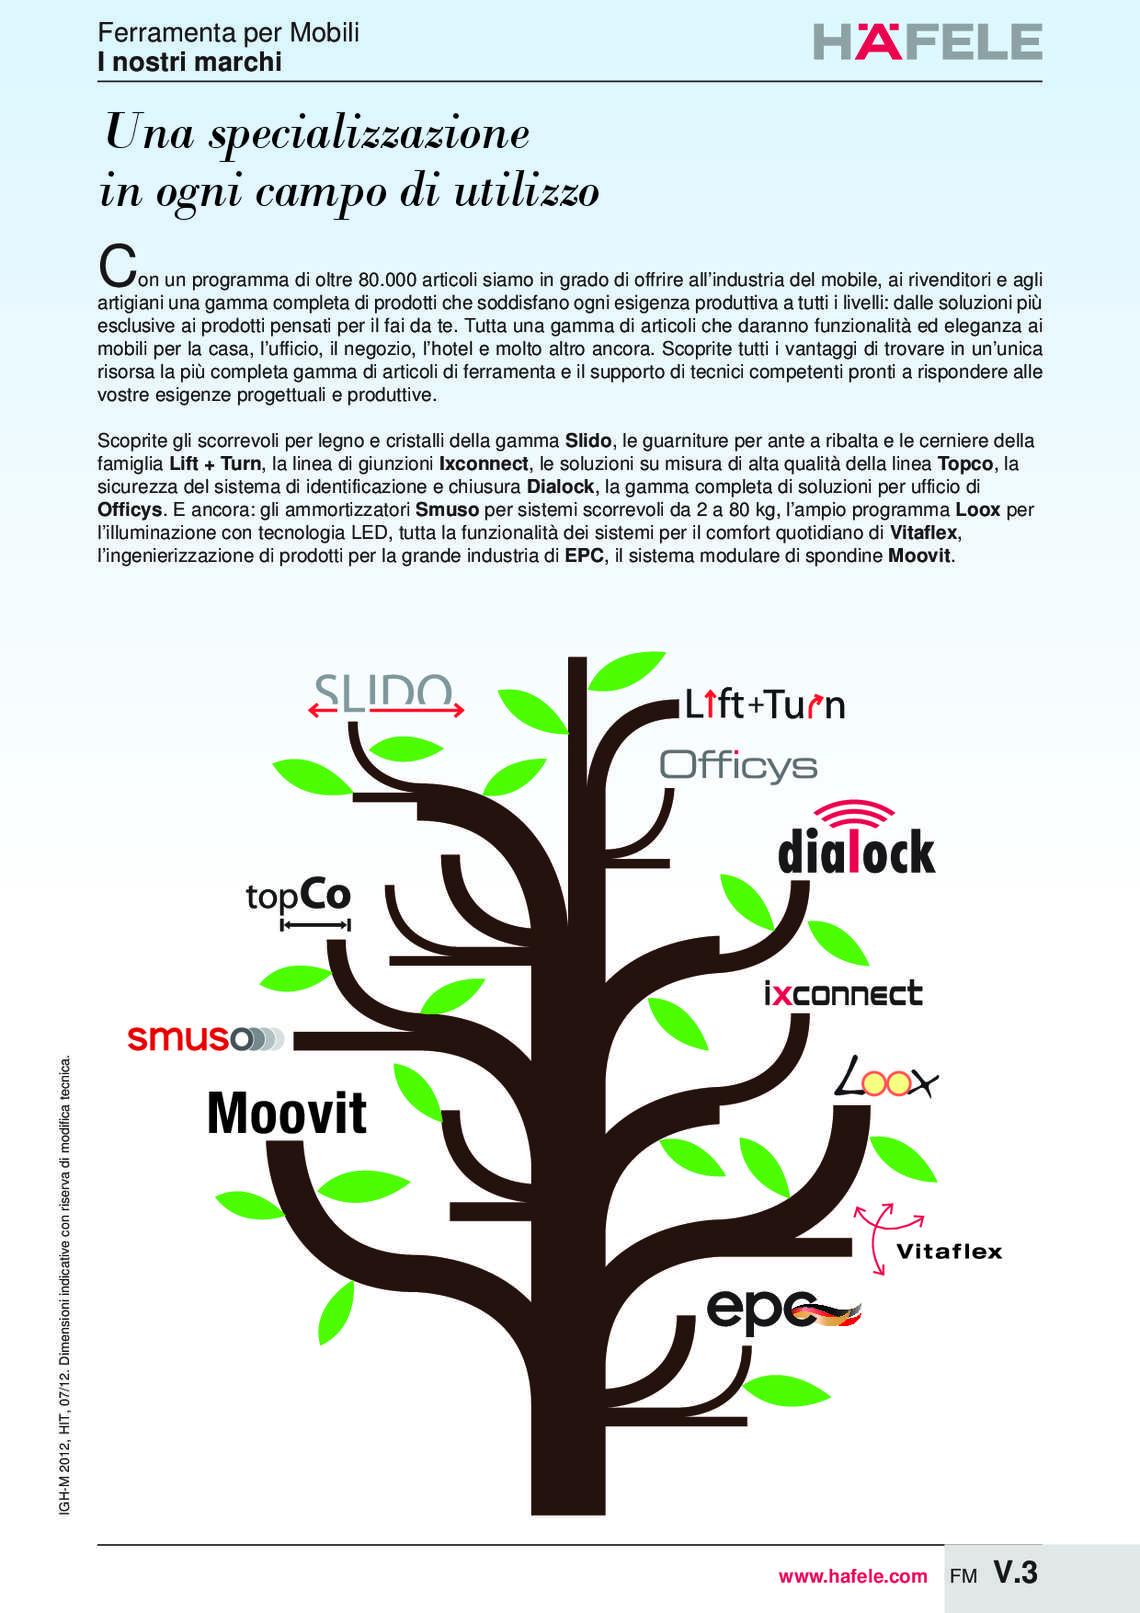 hafele-spondine-e-guide-per-mobili_40_004.jpg